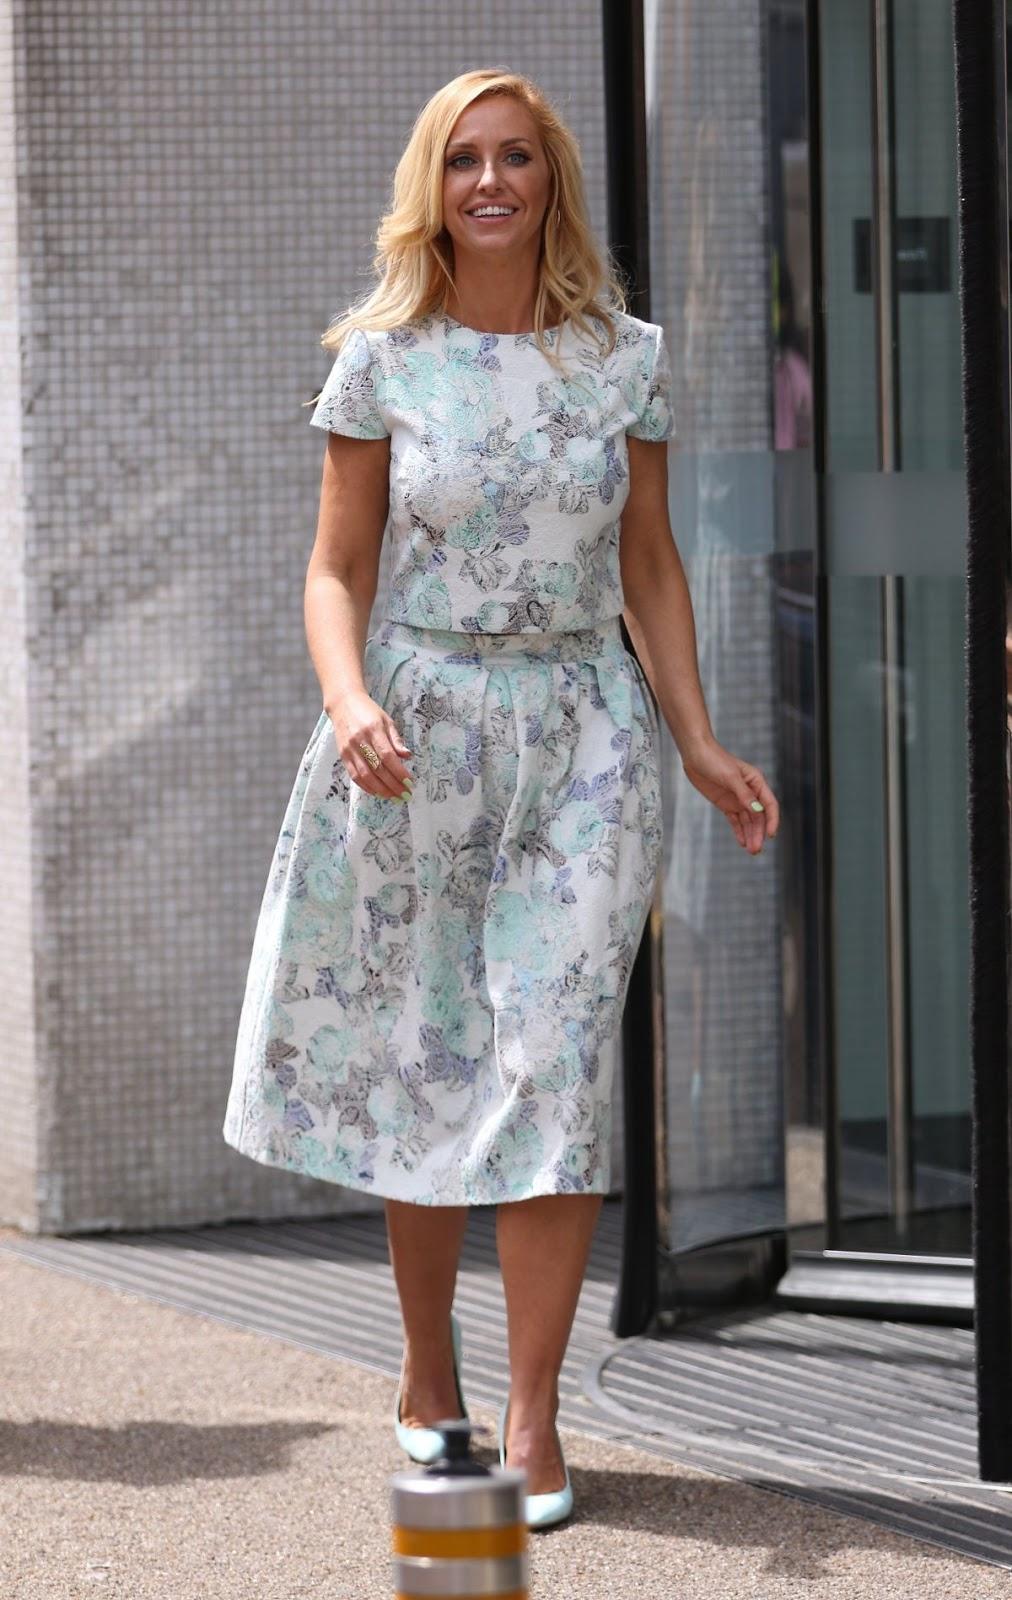 HD Photos of Josie Gibson at London ITV Studios